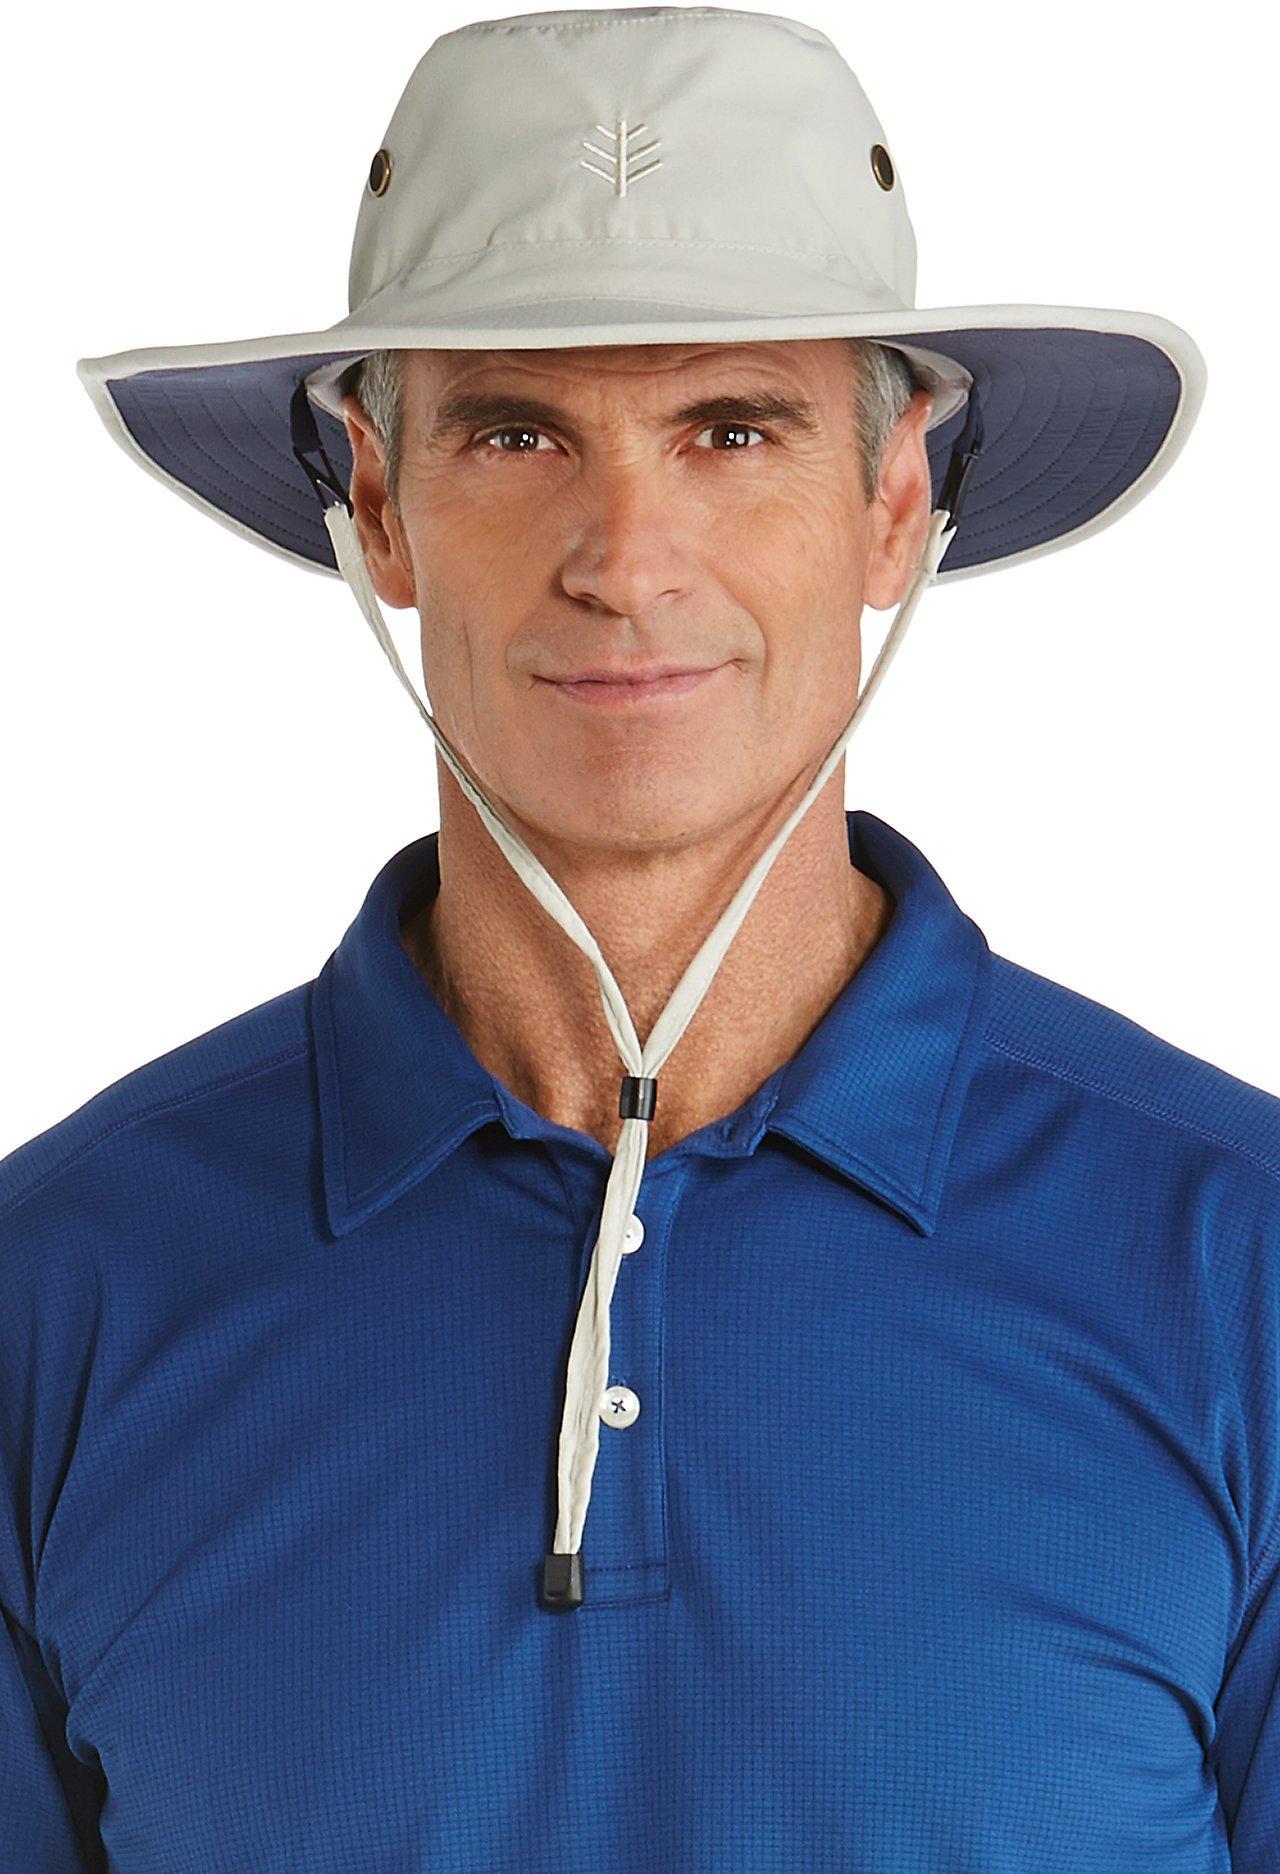 Coolibar UPF 50+ Men's Shapeable Wide Brim Hat - Sun Protective (Large/X-Large- Stone/Navy)